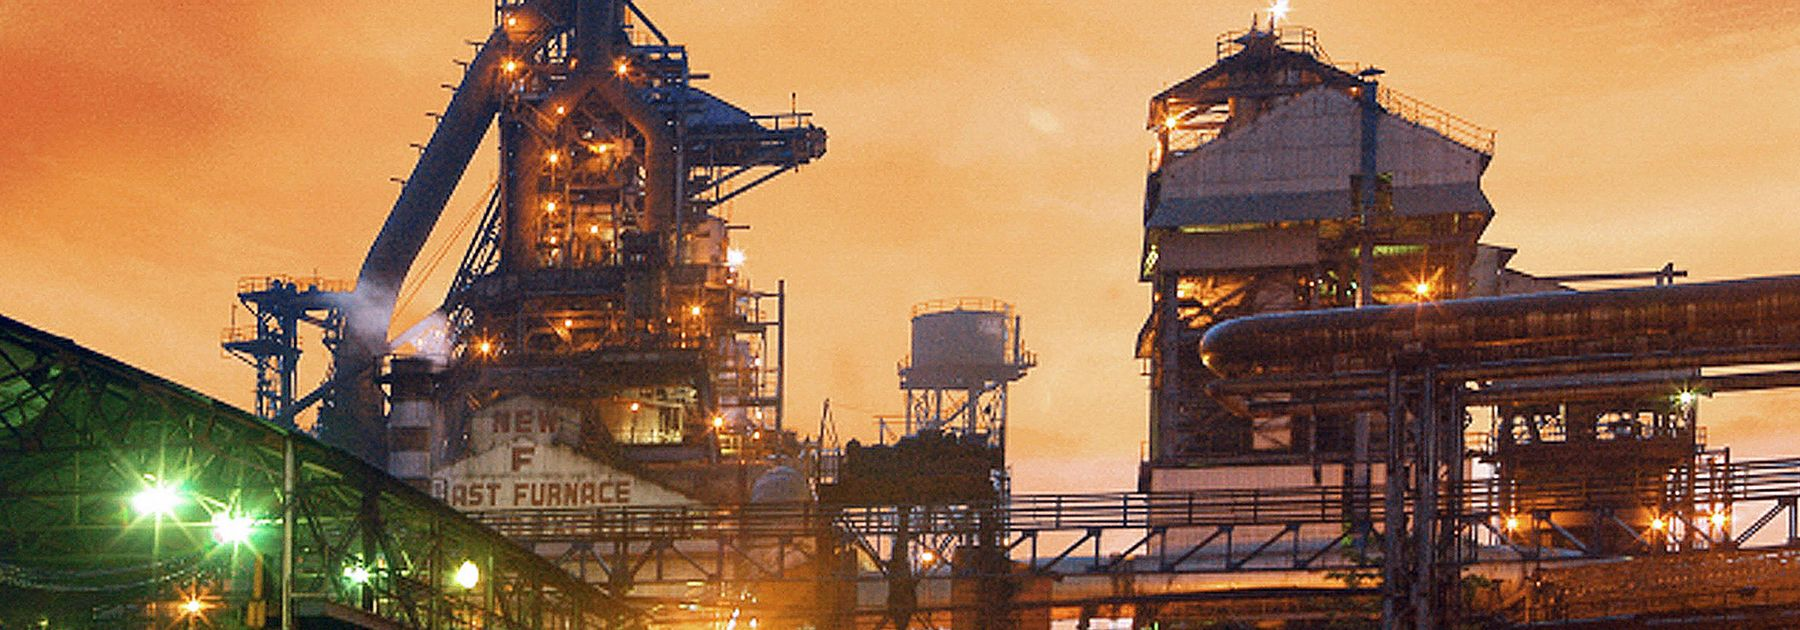 The Tata Steel plant in Jamshedpur. (STRDEL/AFP/Getty Images)